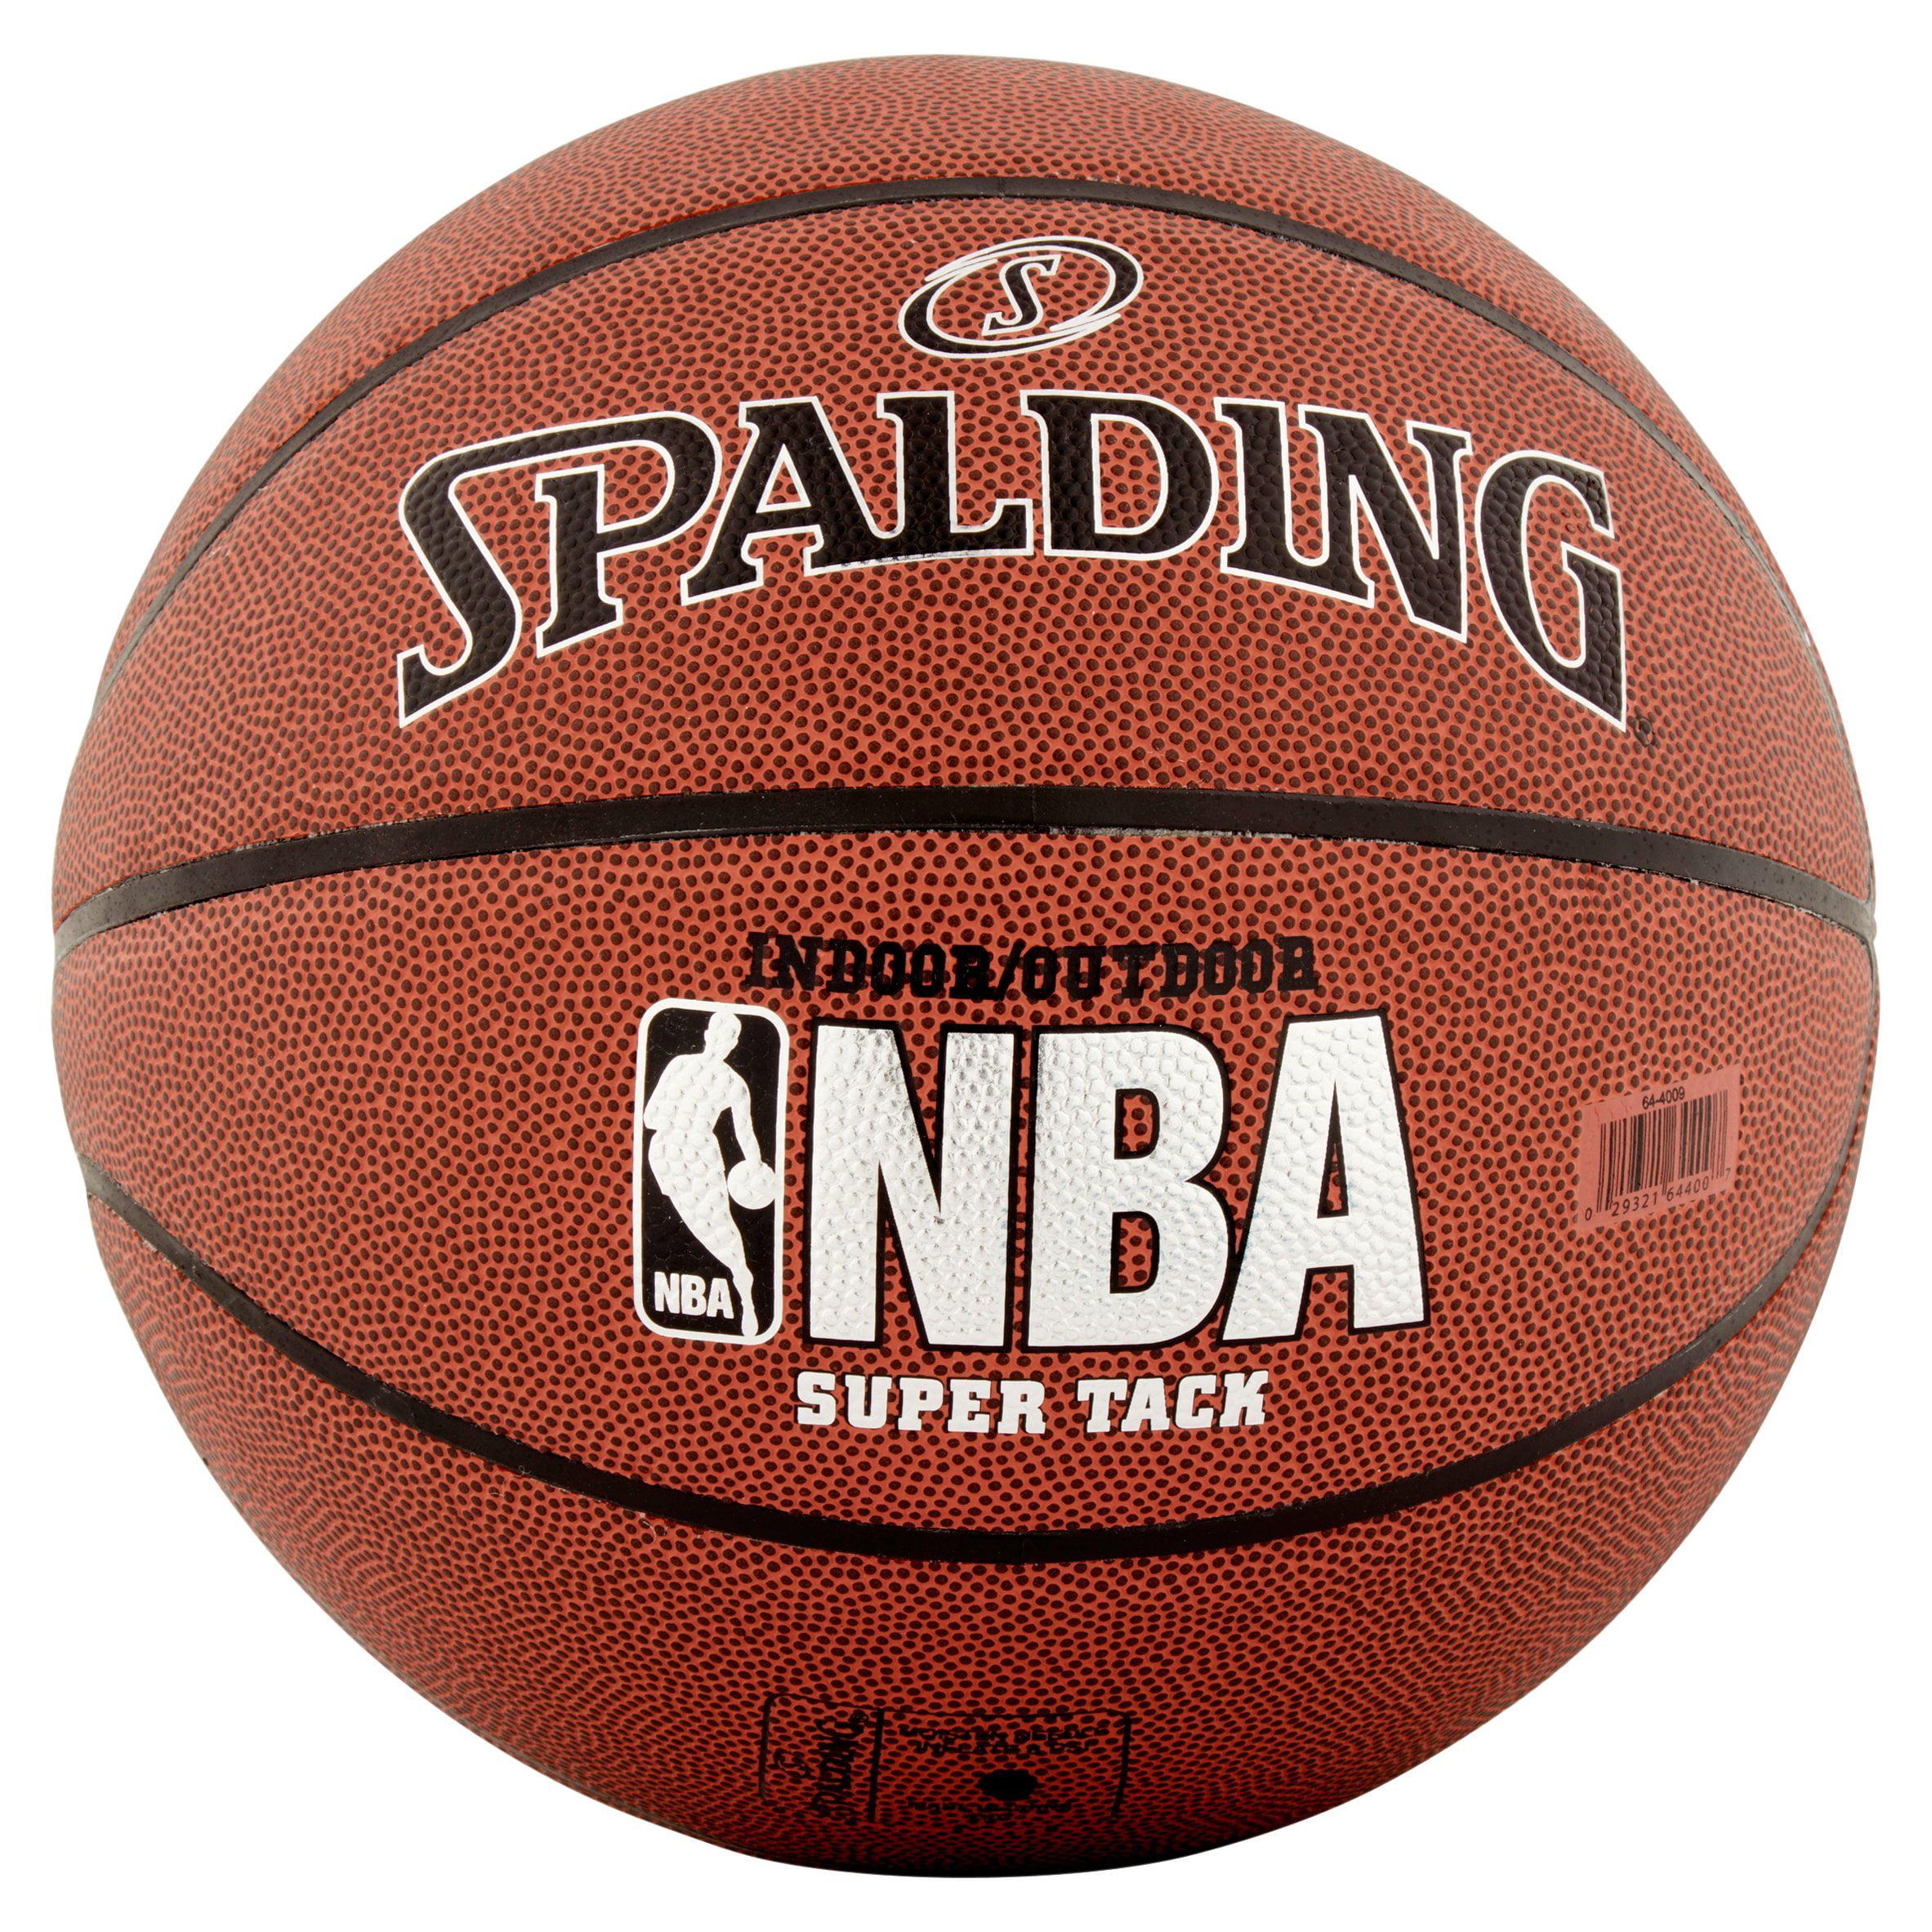 Spalding NBA Super Tack 29.5 Indoor/Outdoor Basketball ...